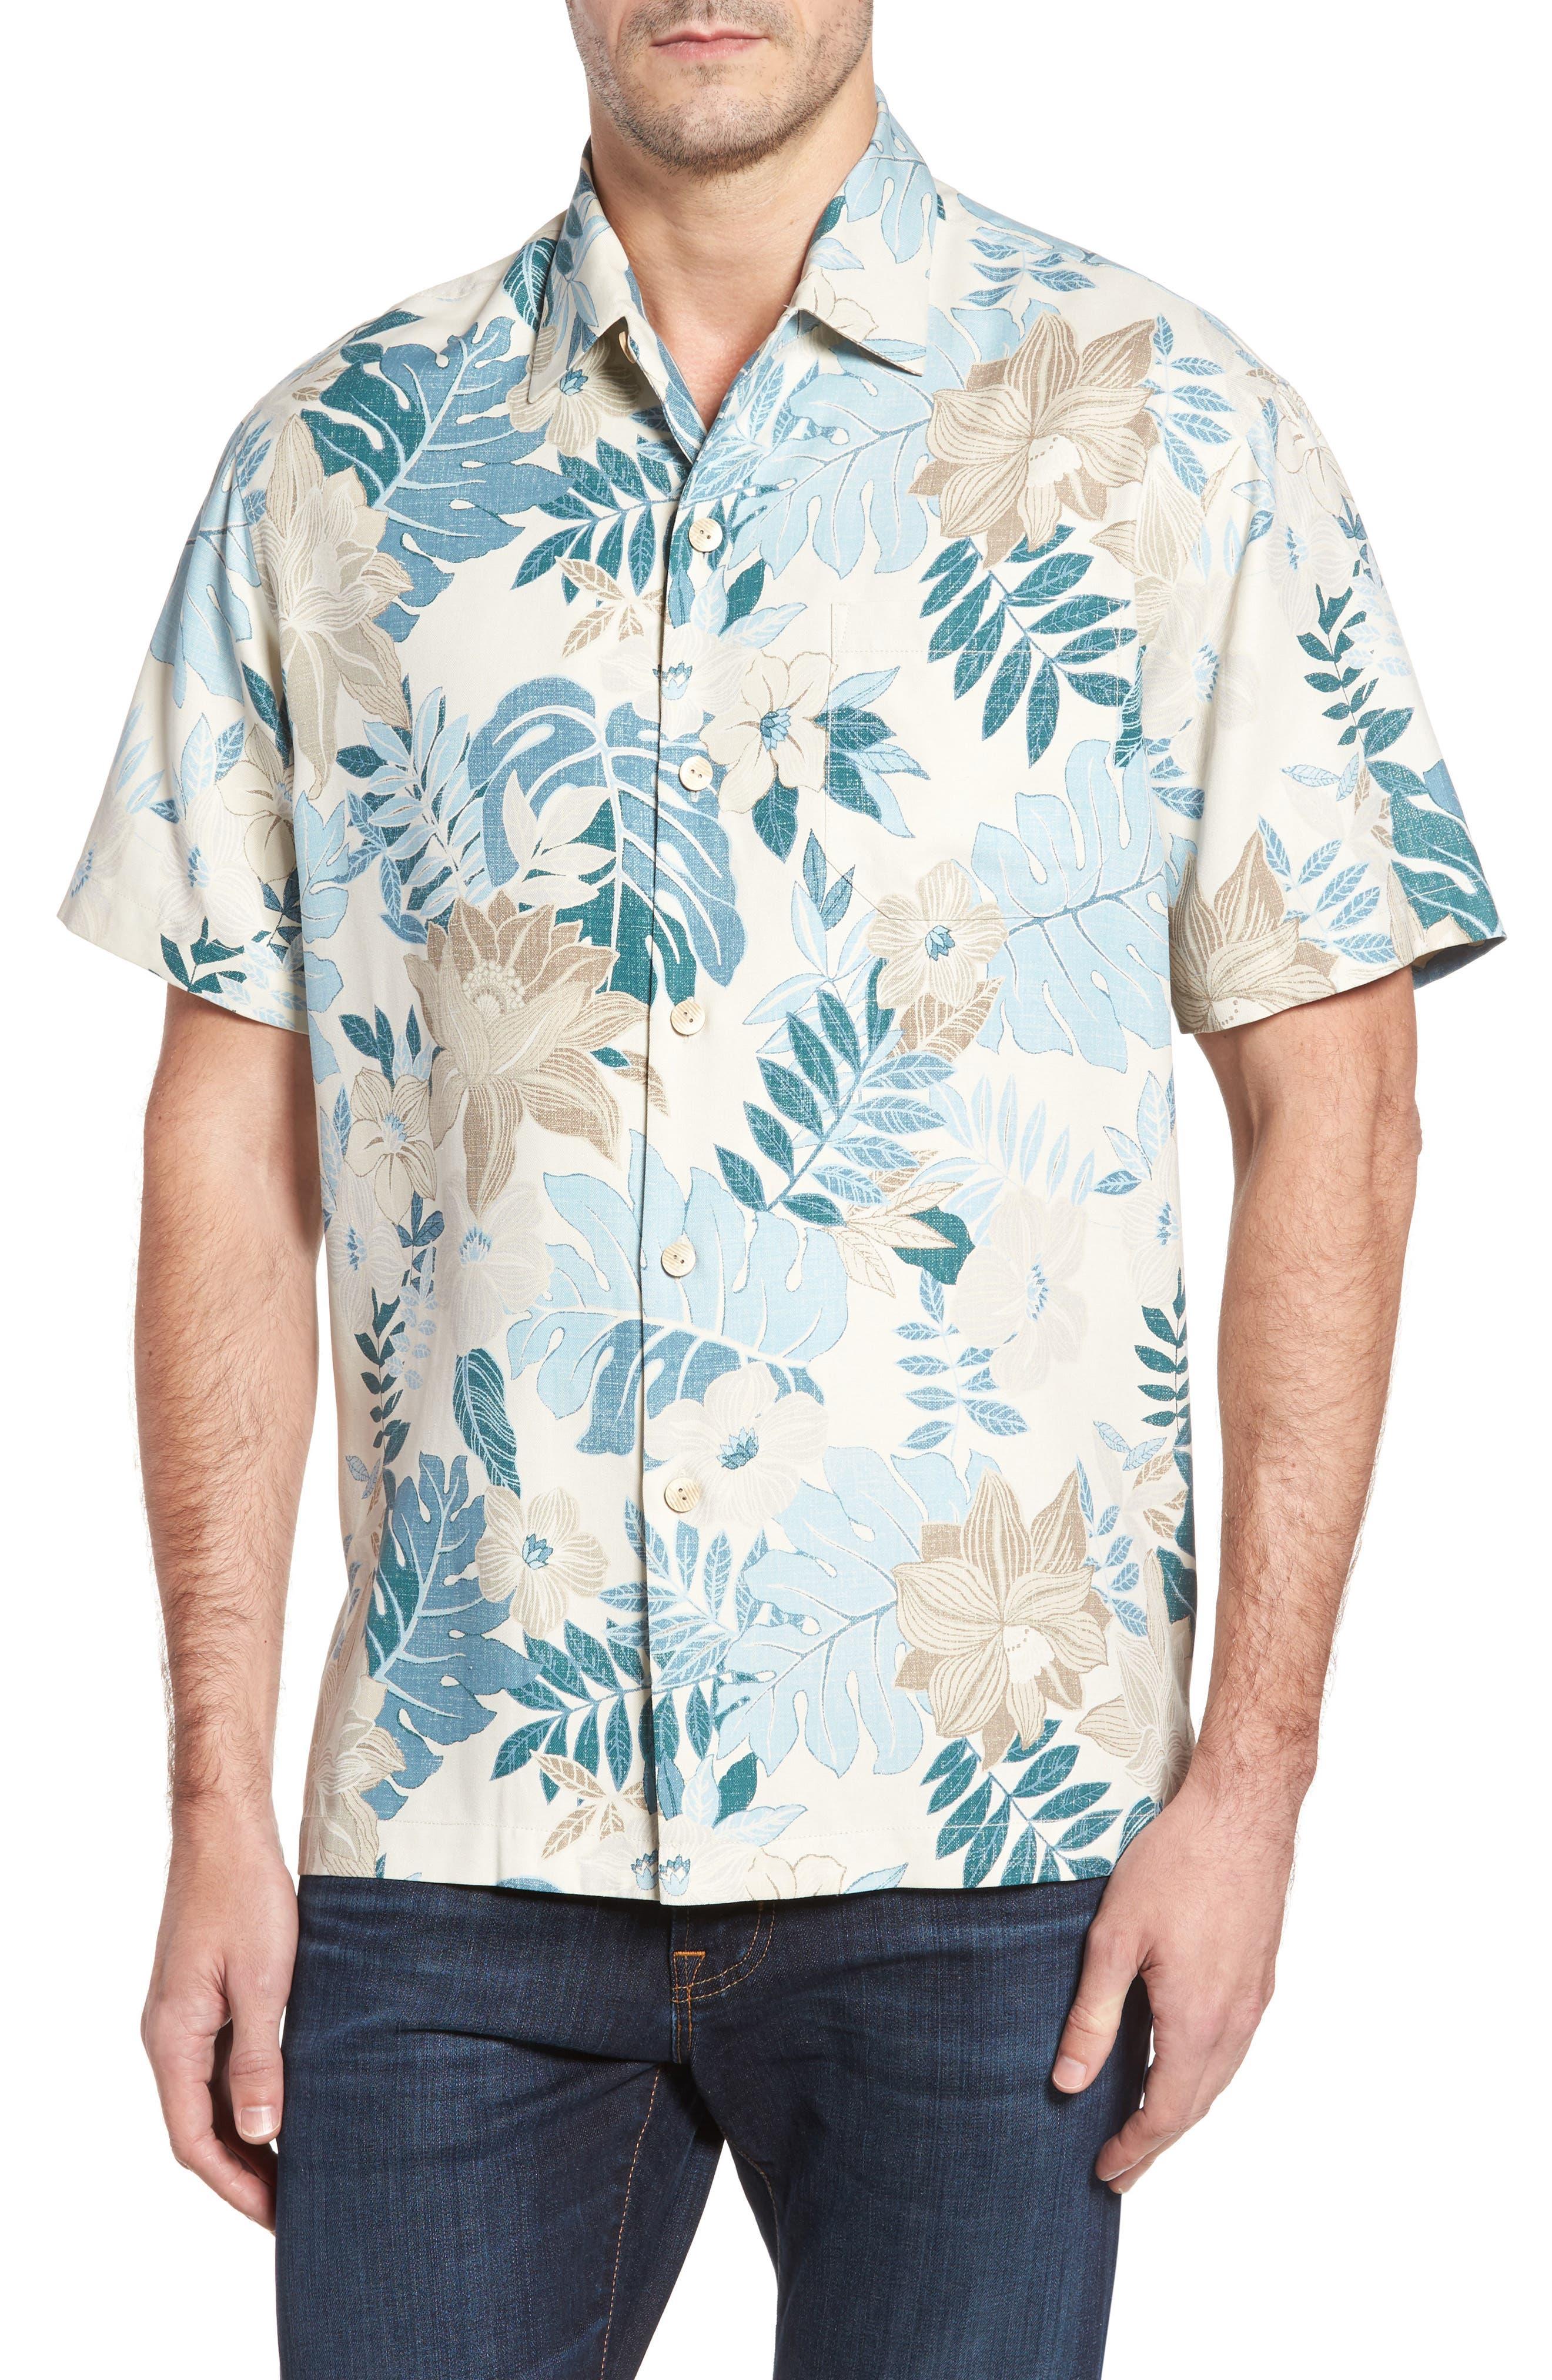 Main Image - Tommy Bahama Desert Blooms Standard Fit Silk Camp Shirt